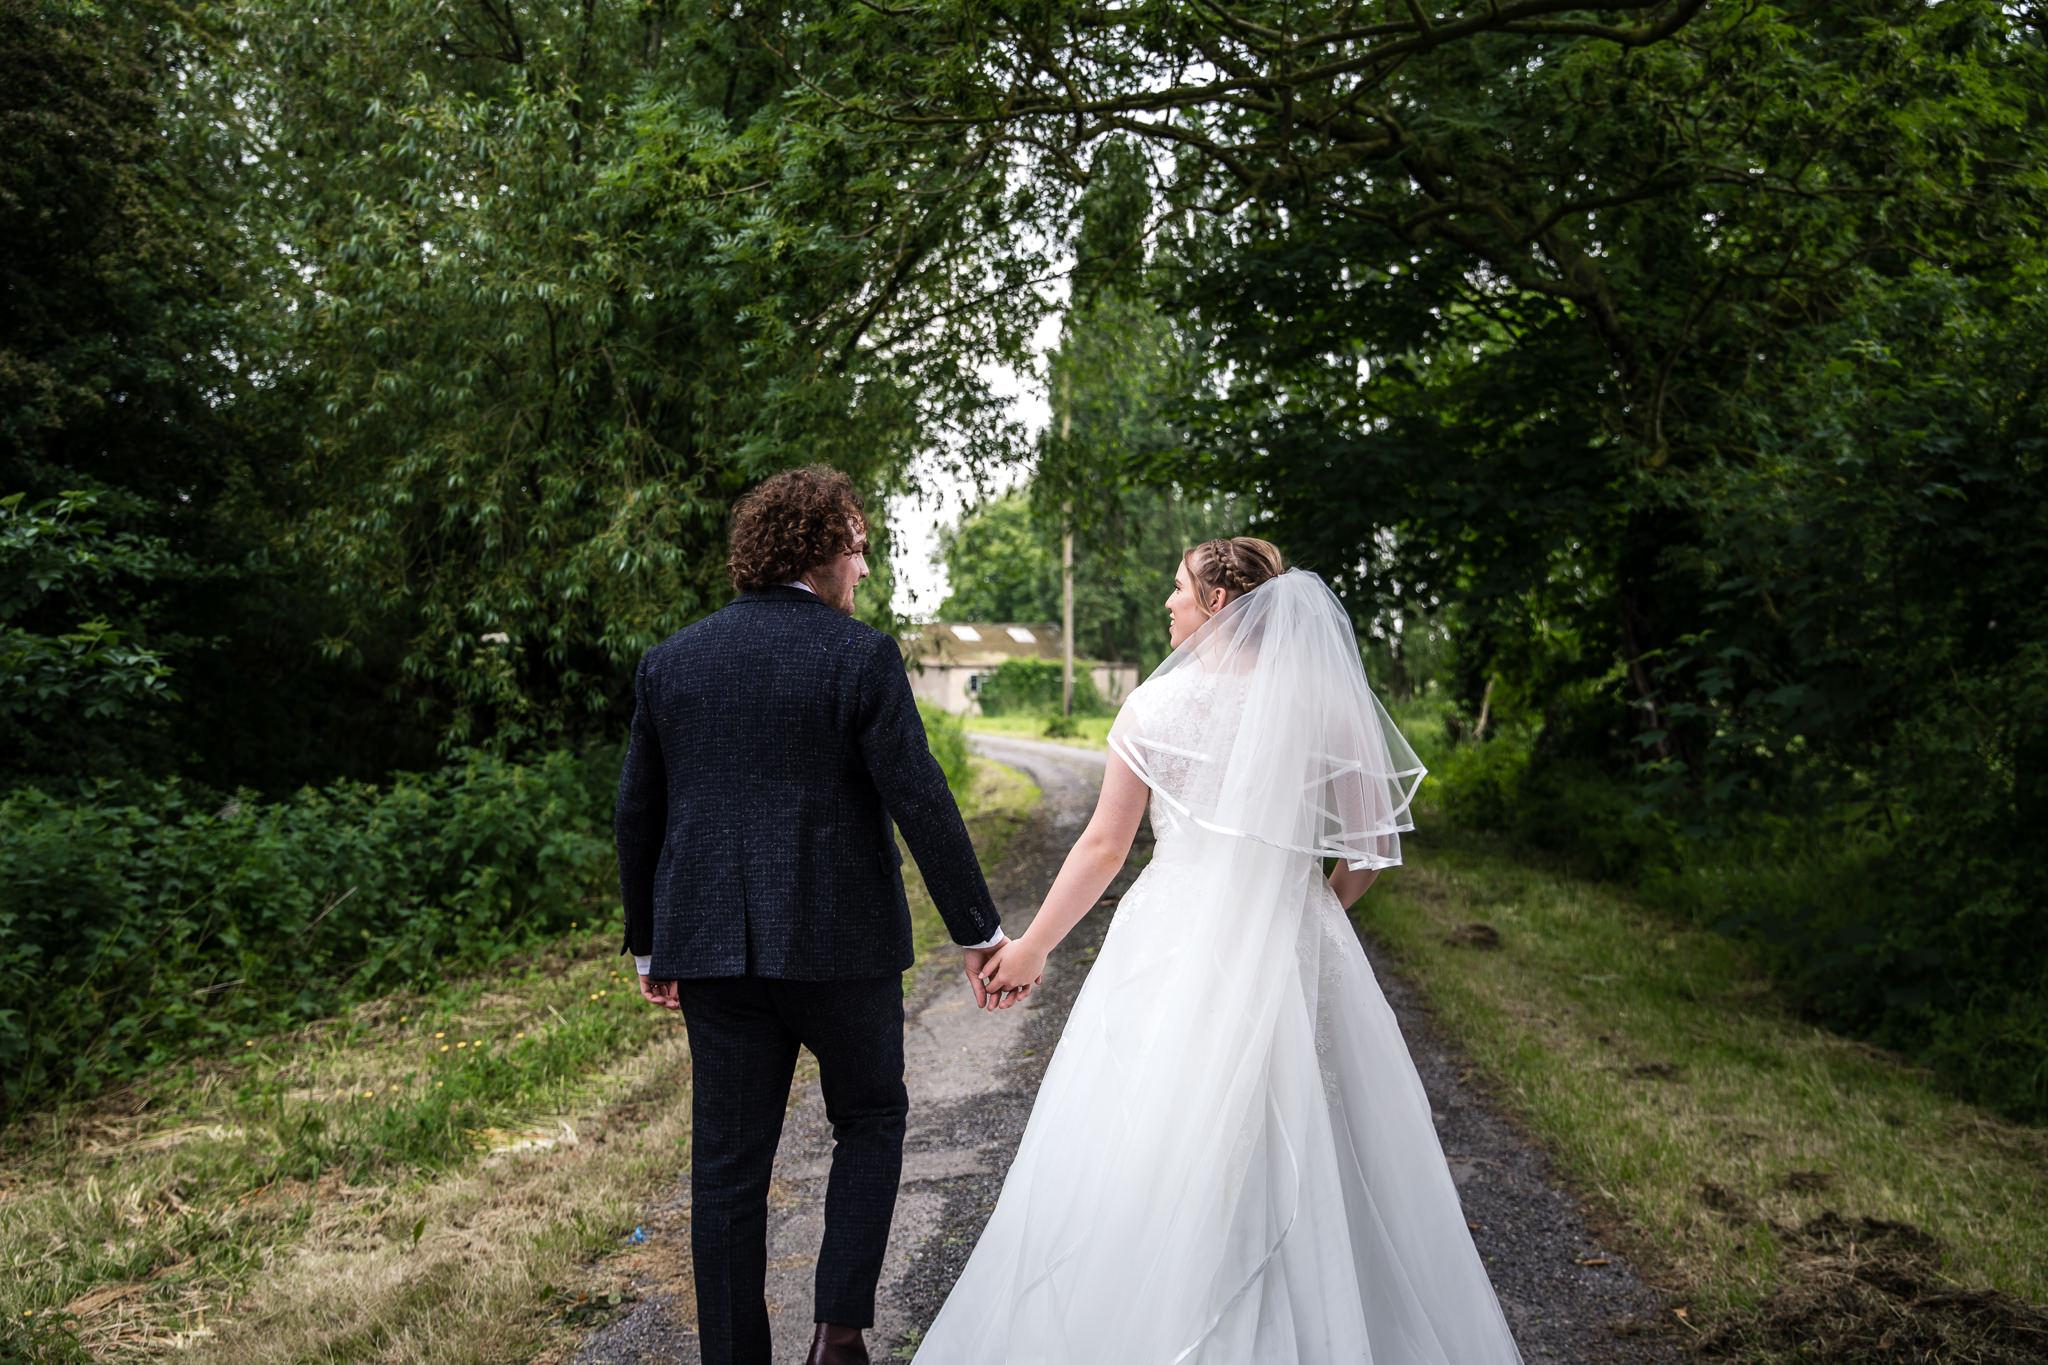 nottingham wedding43